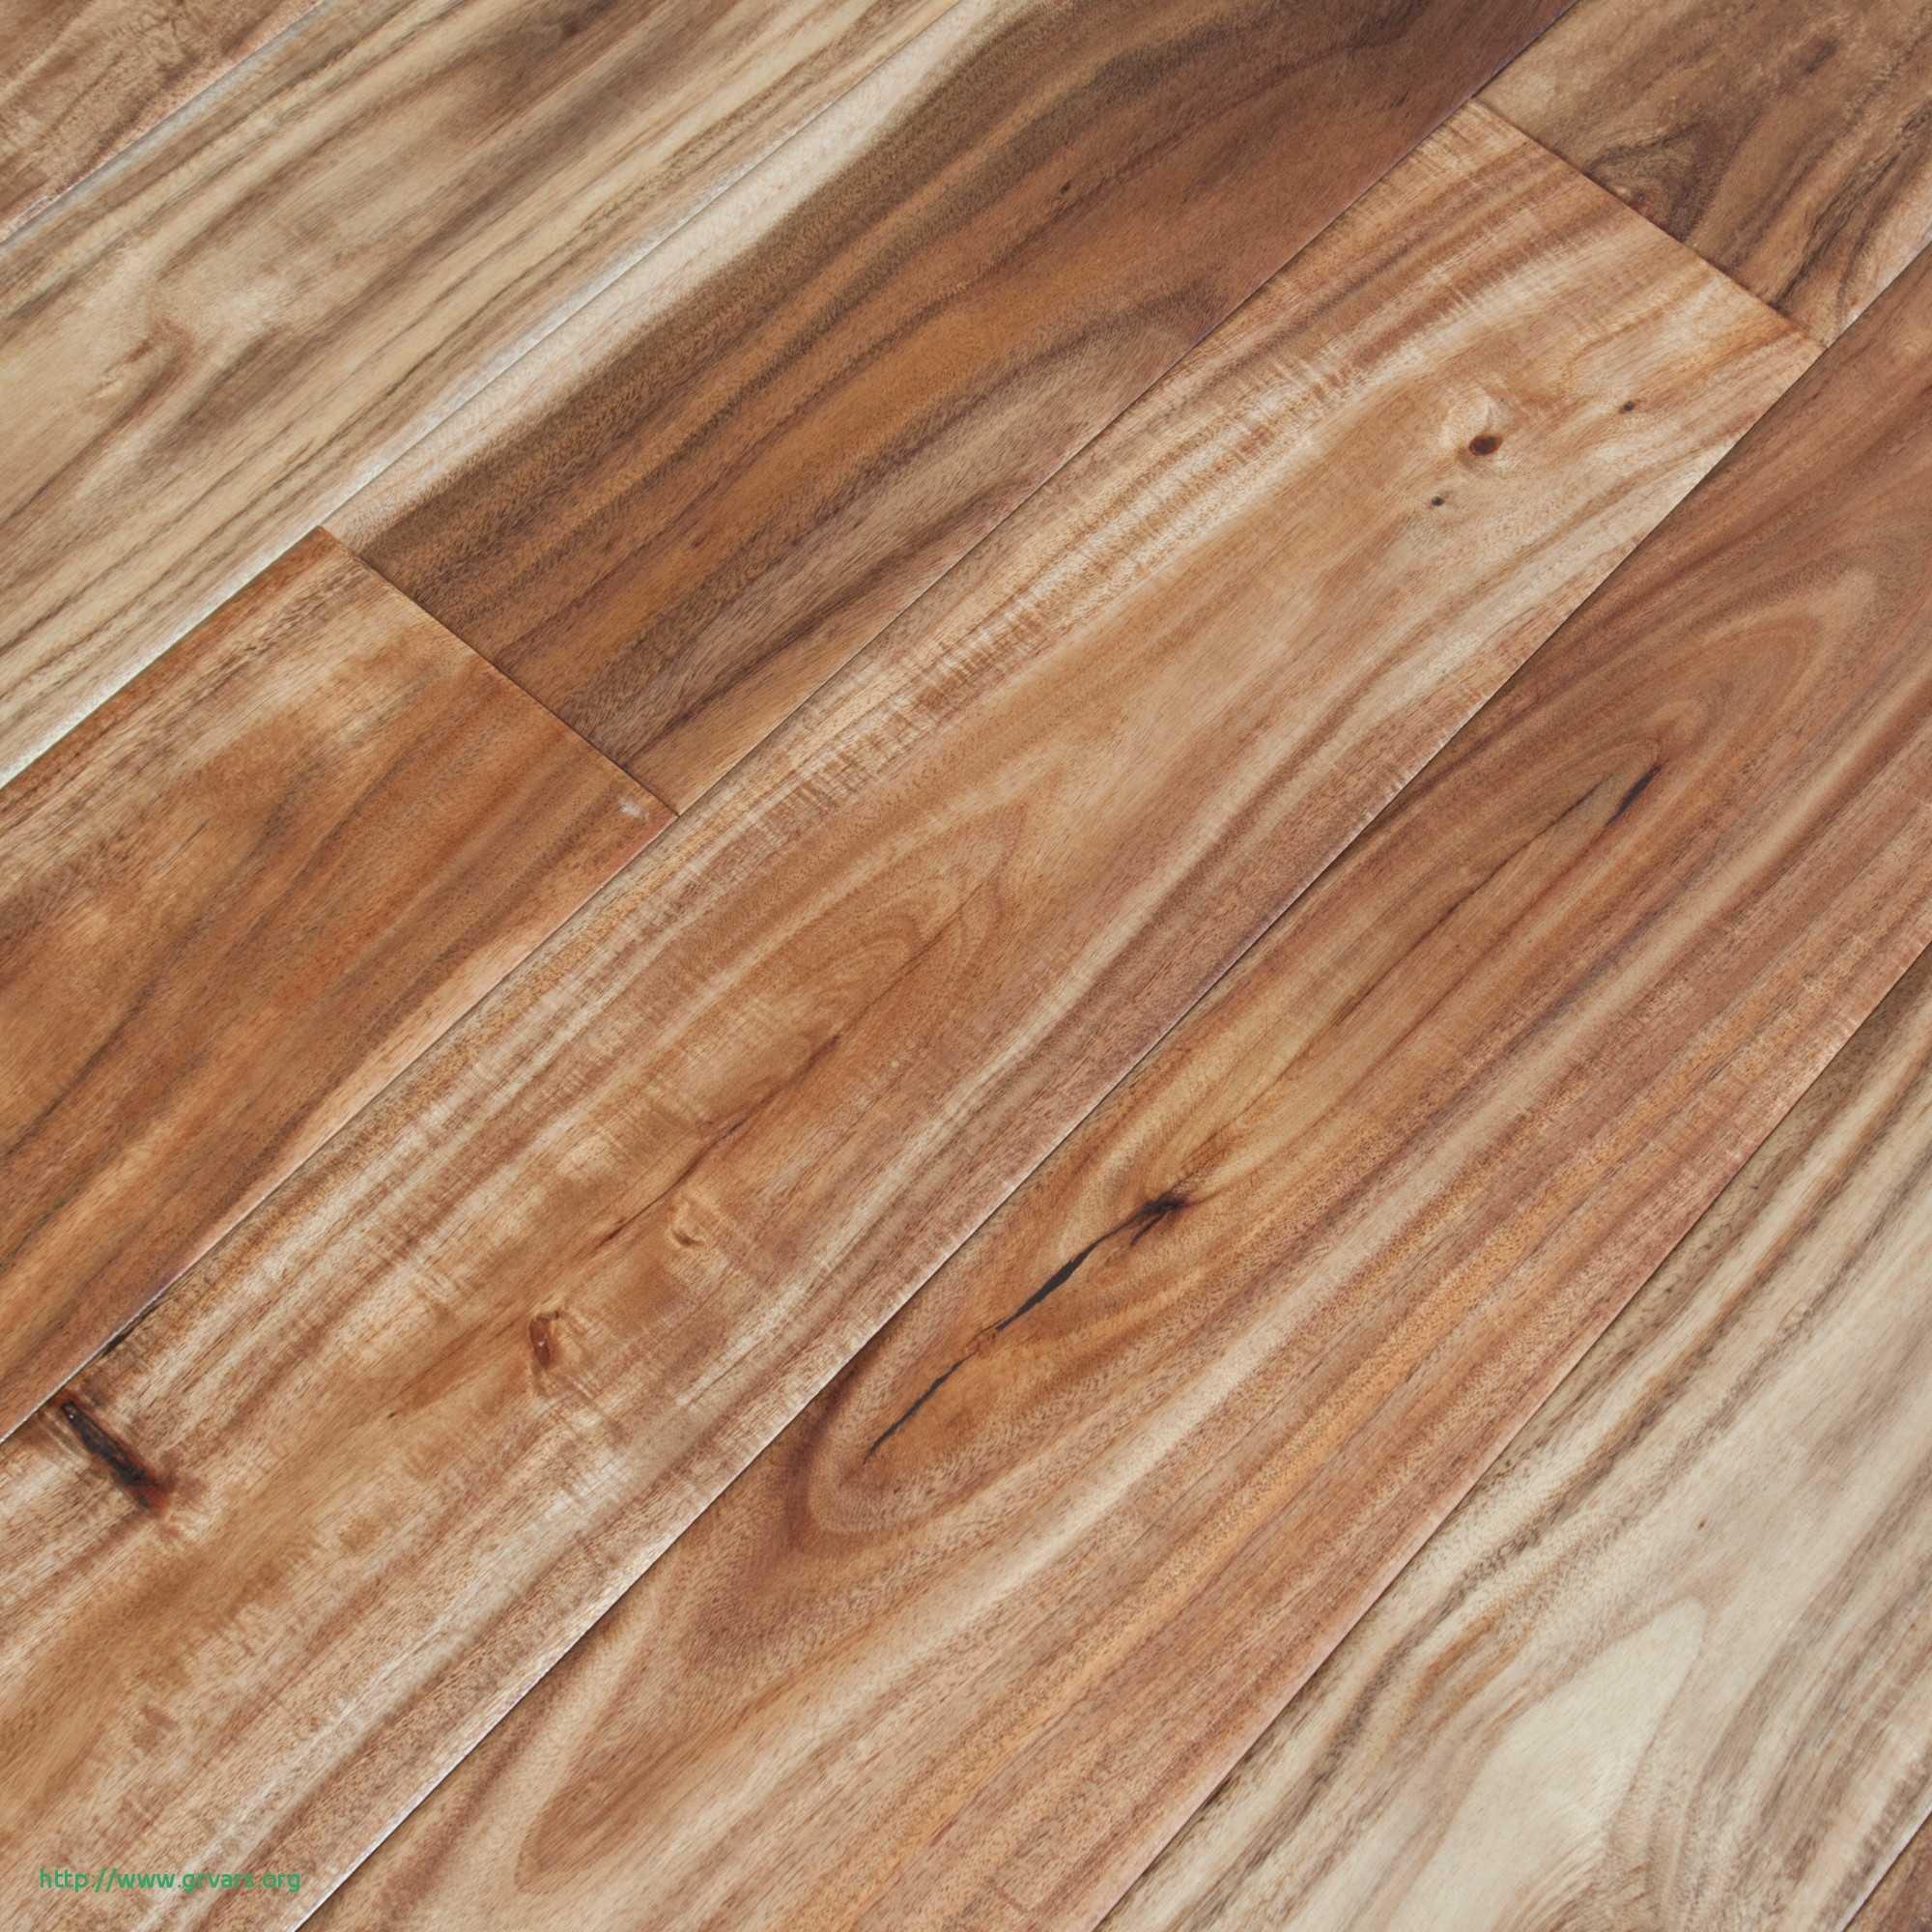 hardwood floor restoration toronto of 28 new handscraped engineered hardwood photos flooring design ideas regarding handscraped engineered hardwood elegant hardwood floor plank sizes frais why your engineered wood flooring images of